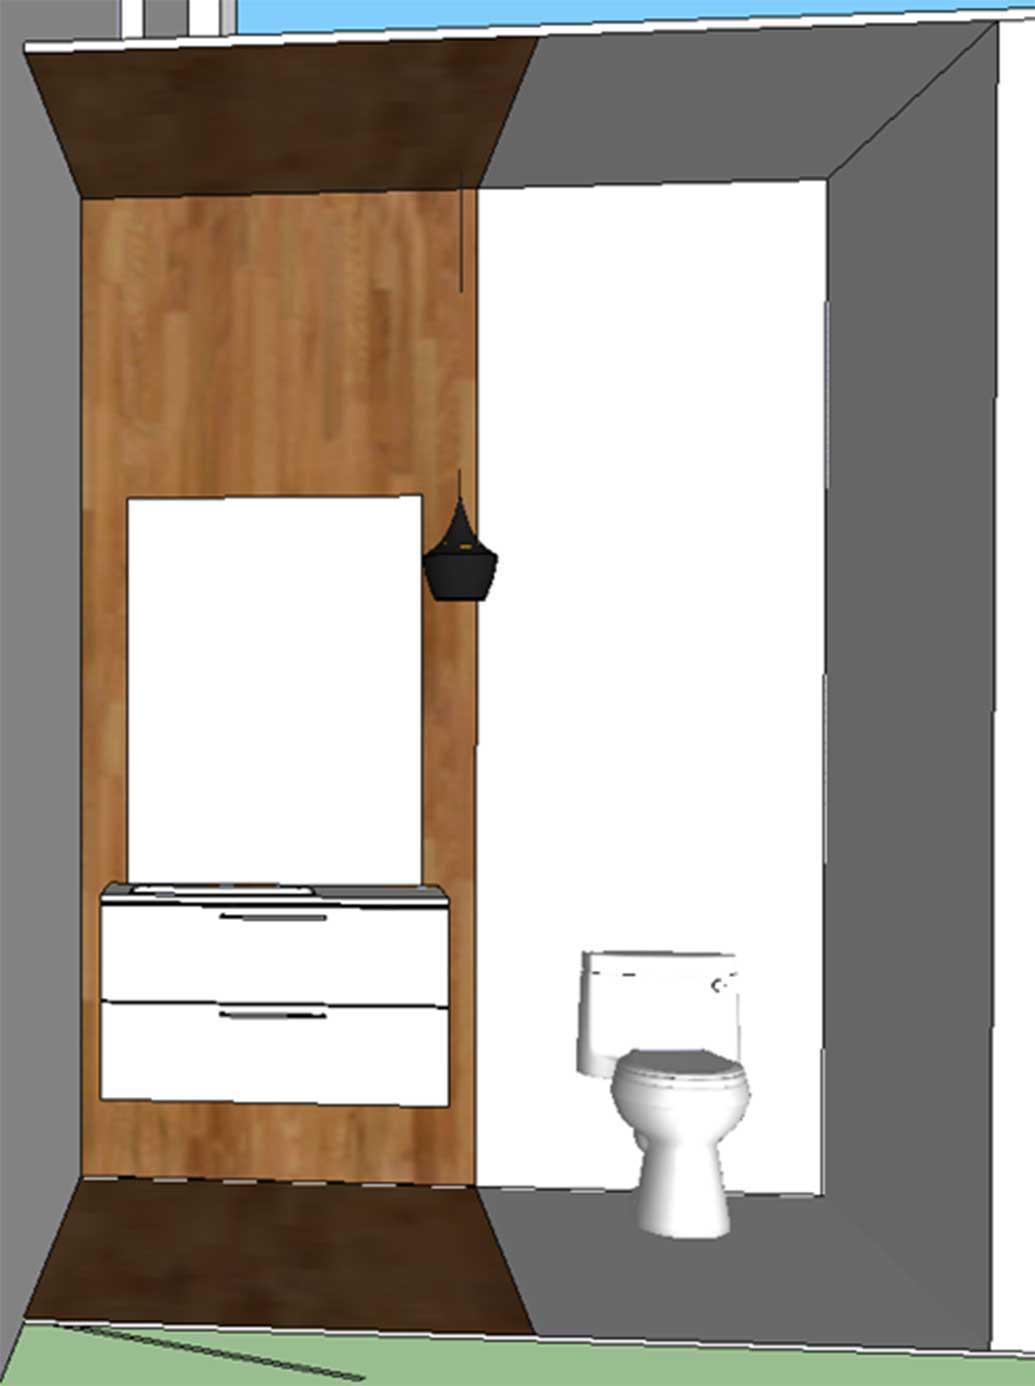 Residential design developed by DKOR Interiors